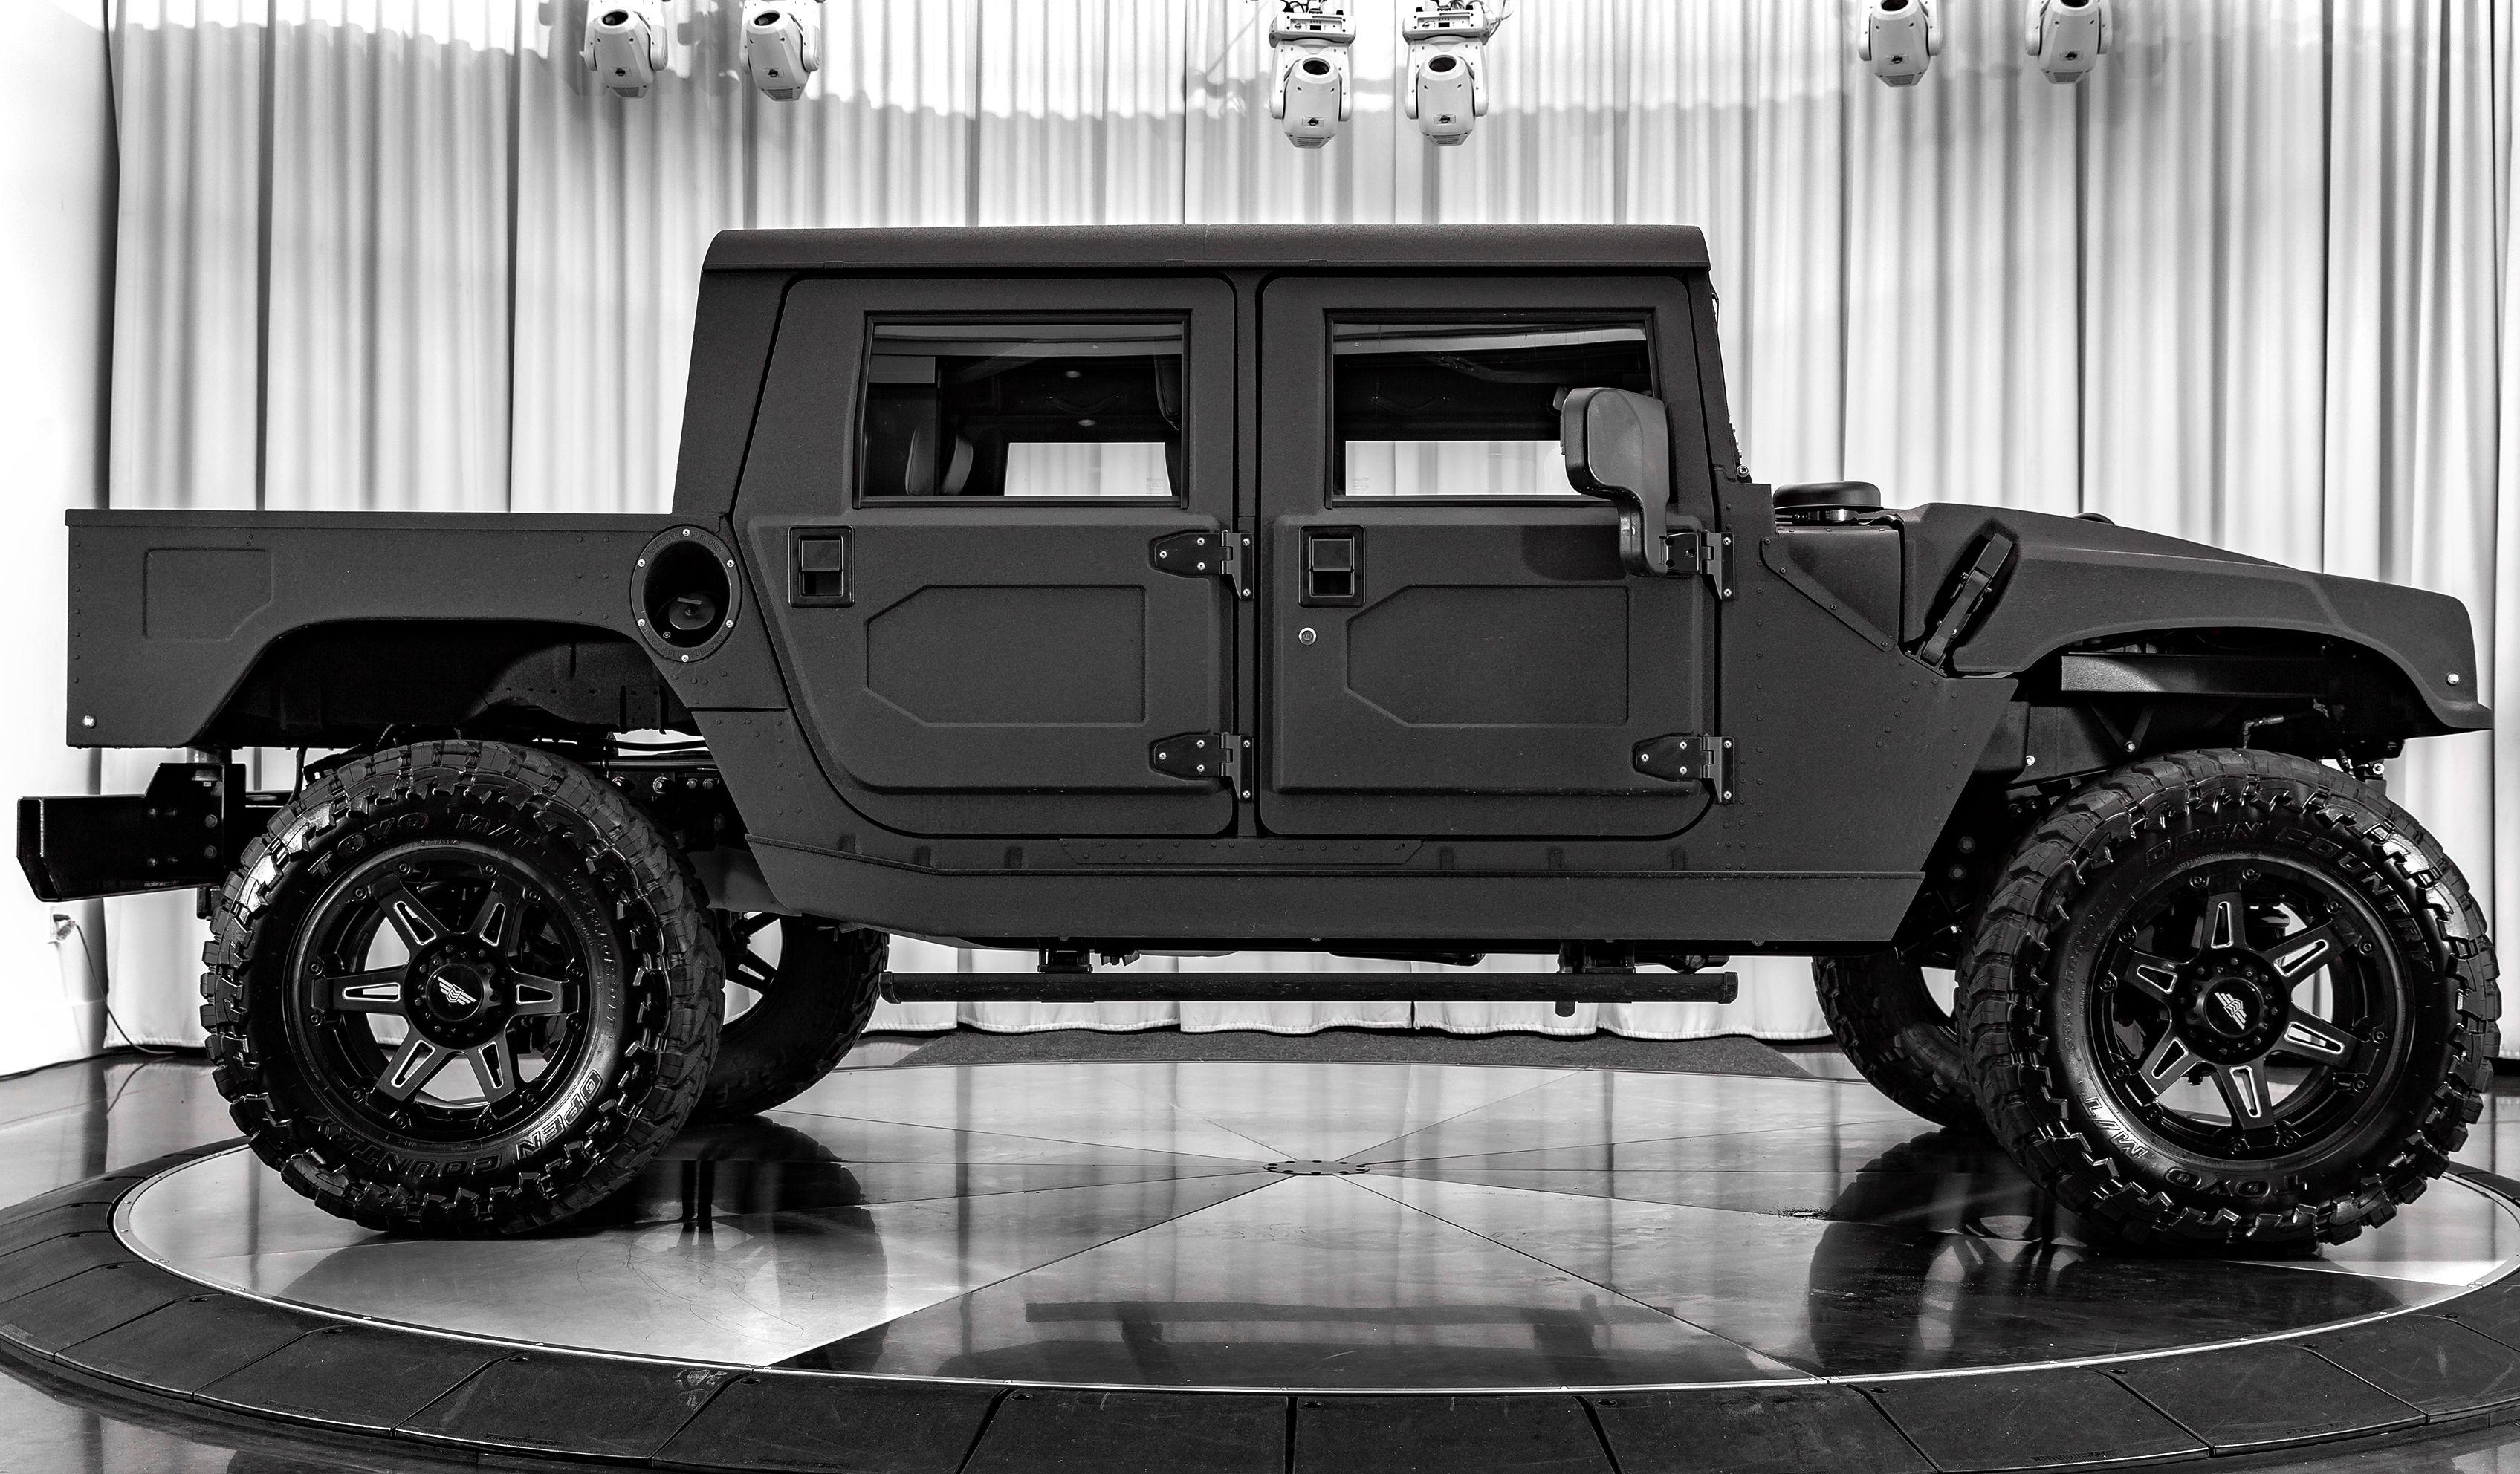 Mil-Spec-Hummer-H1-pickup-hardtot-launch-edition-2019-5